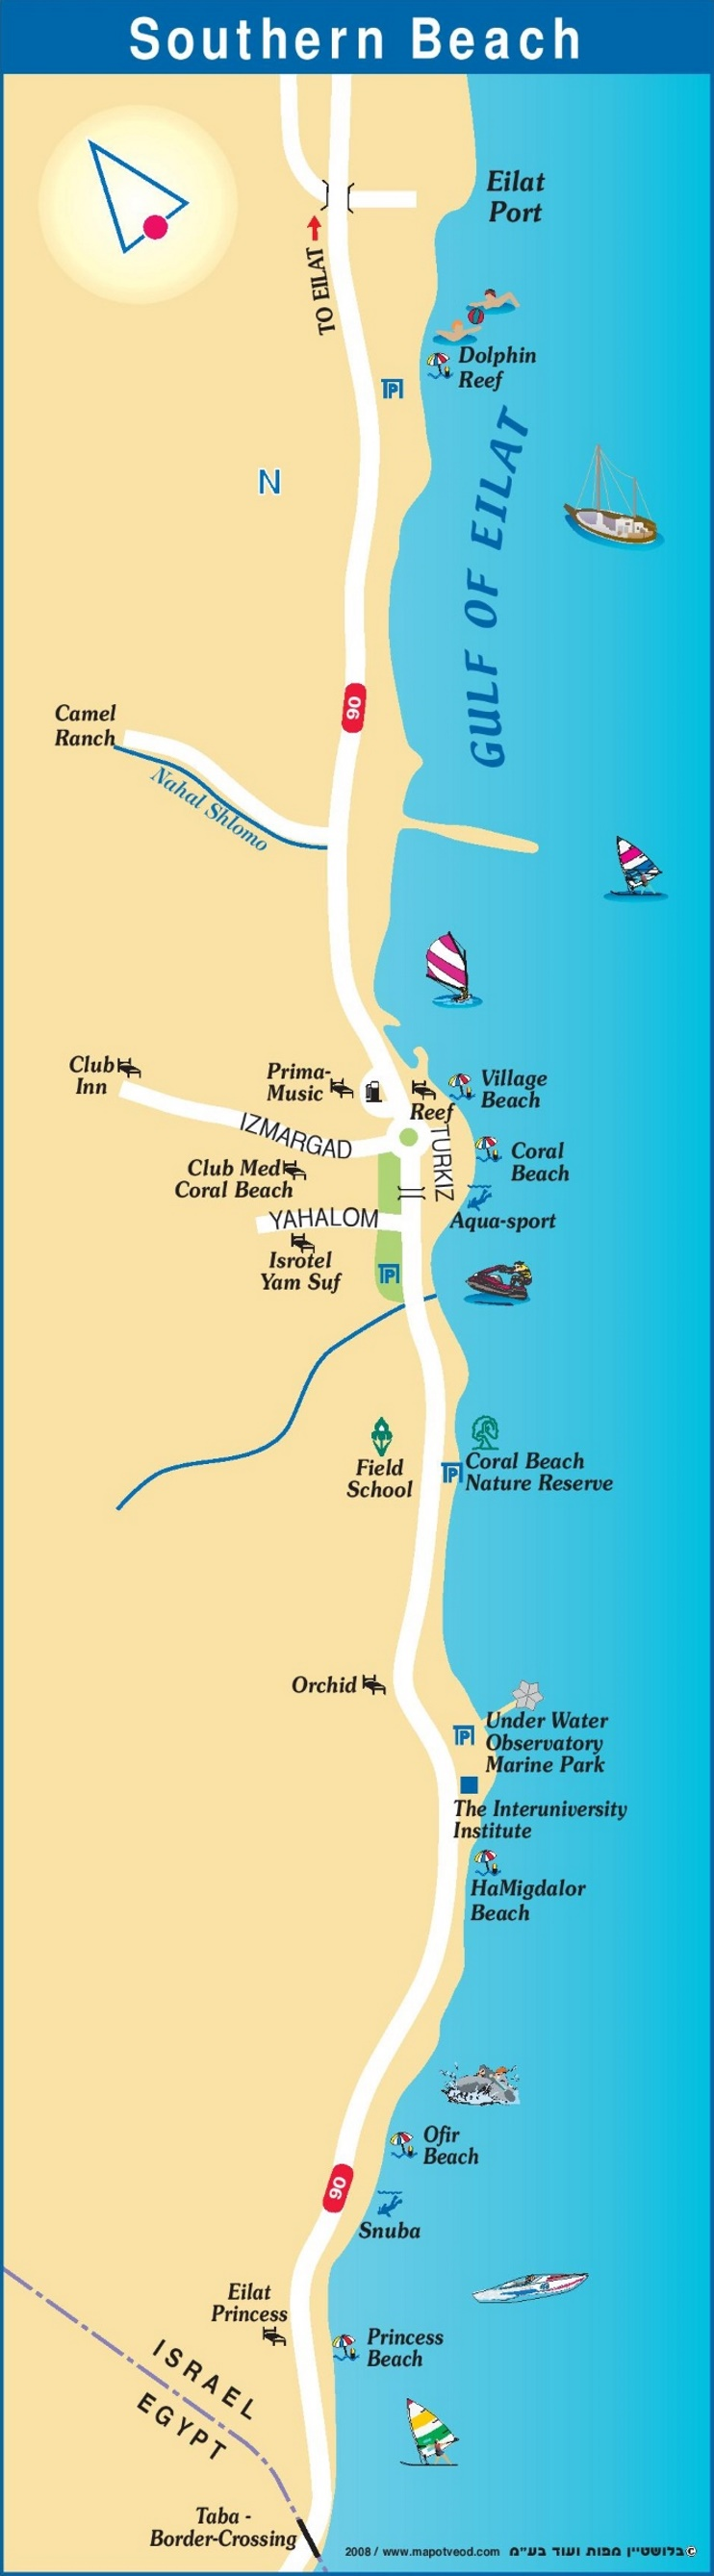 Eilat Southern Beach map